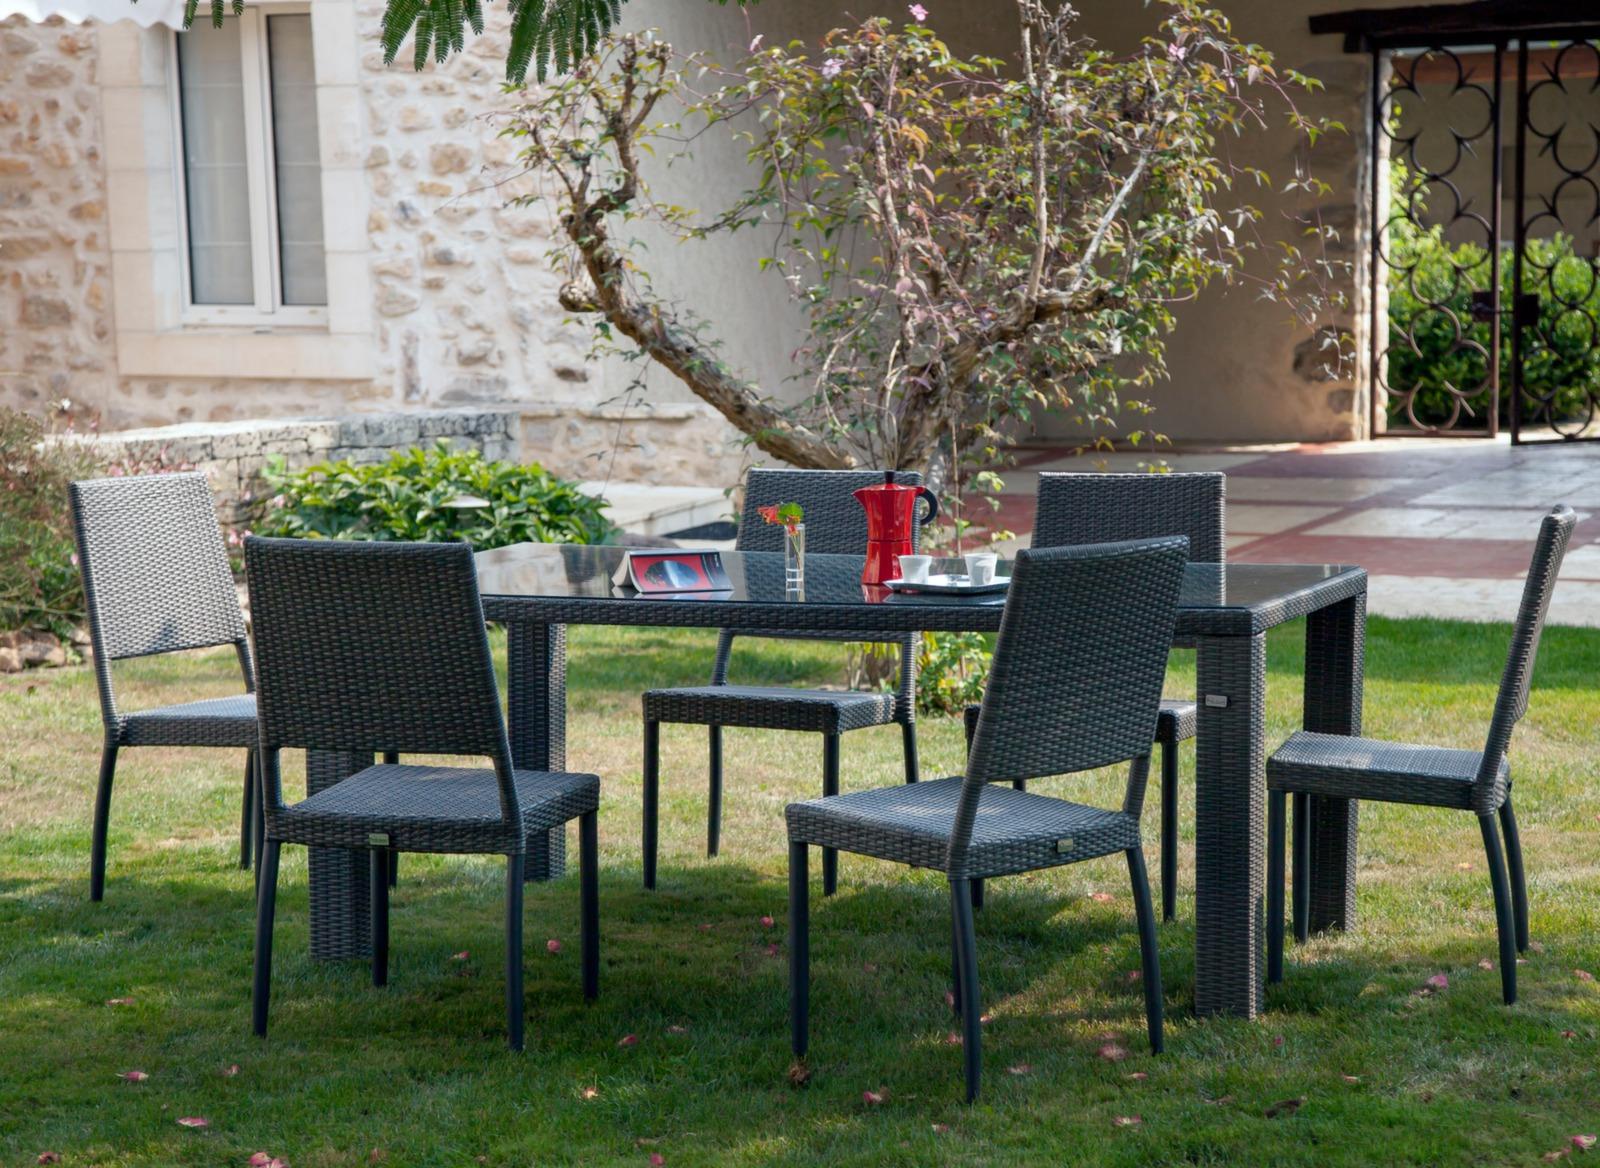 Table de jardin r sine et verre tremp faro proloisirs for Faros para jardin